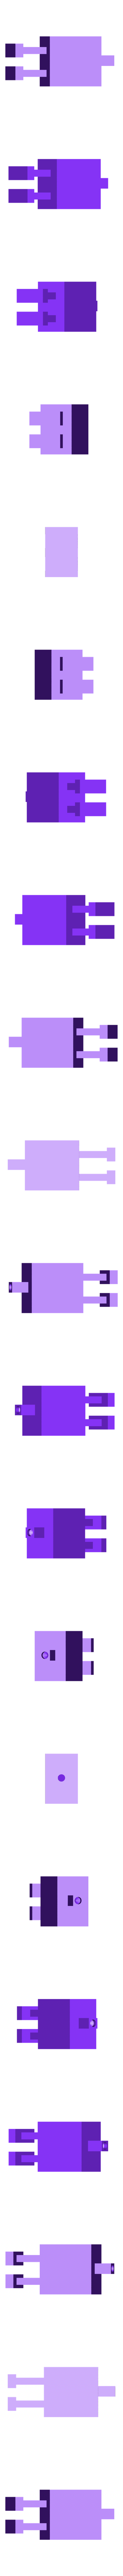 Corps.stl Download free STL file Robotic mascot robot V2 • 3D printer template, EdeziV